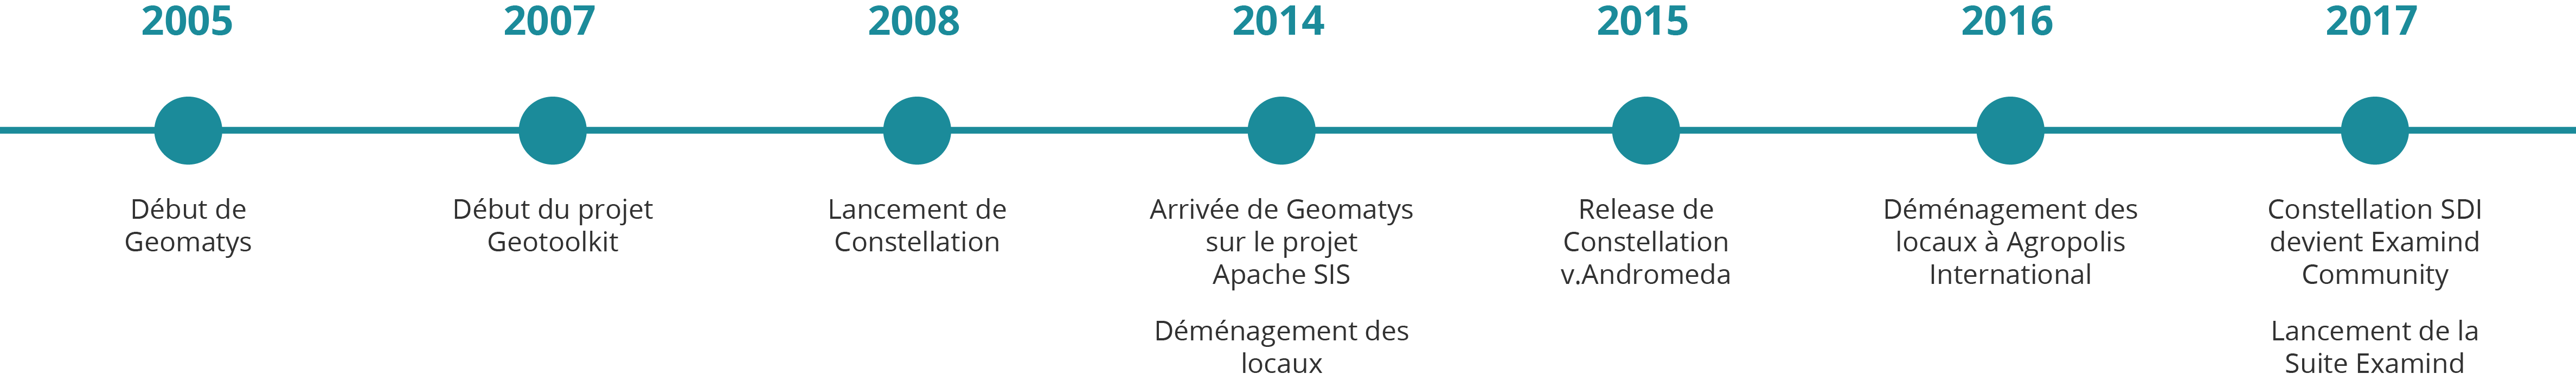 Historique de Geomatys